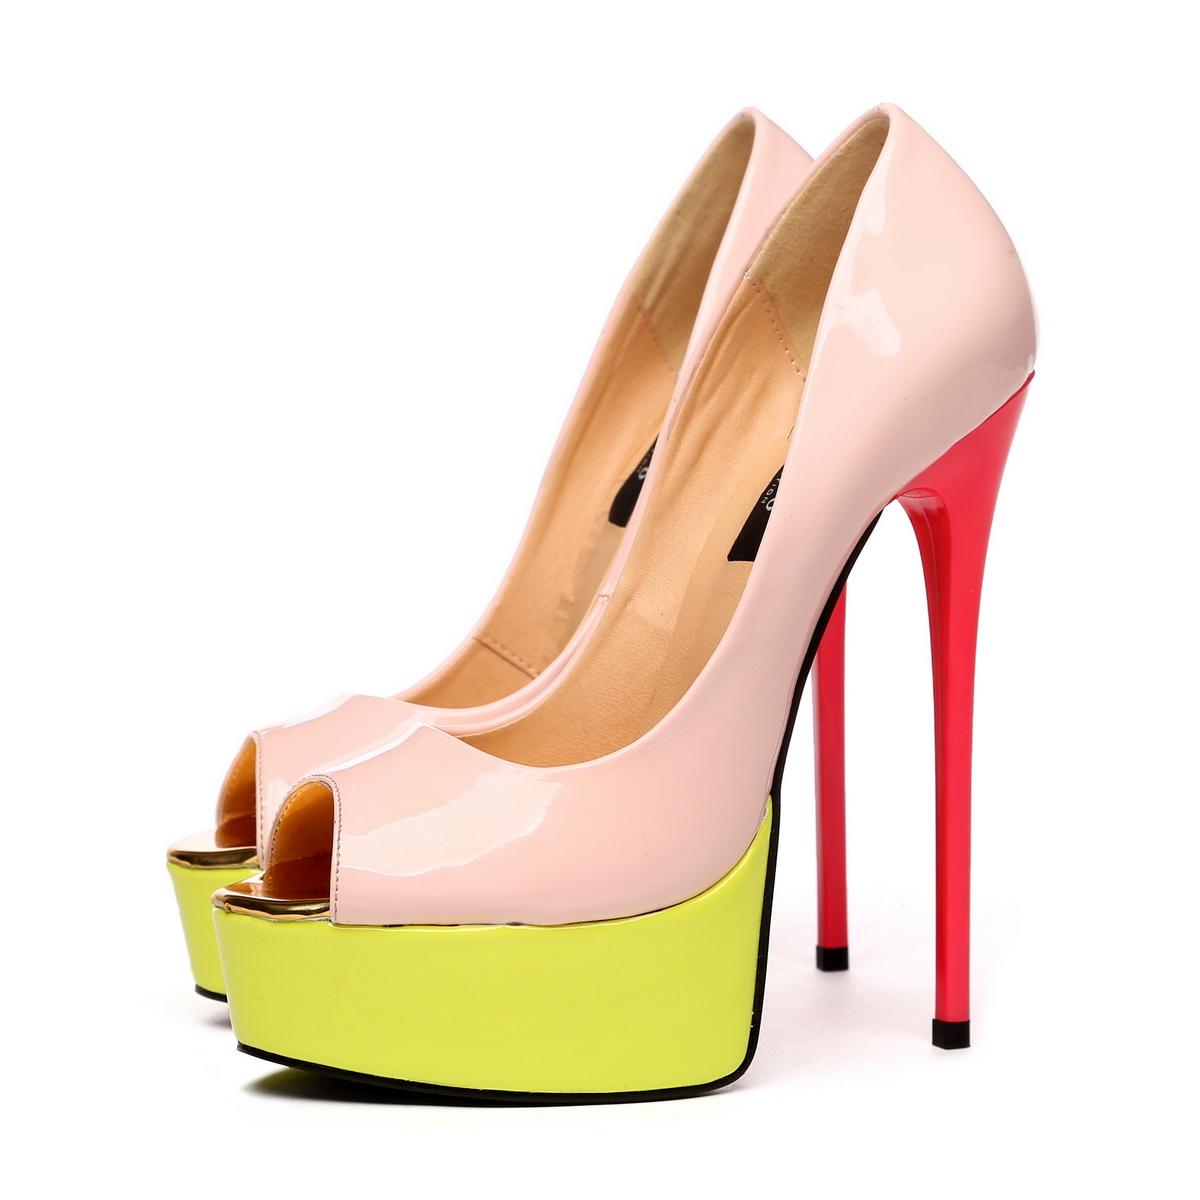 GIARO - Damen Plateau High Heel Pumps - Lack Merfarbig Schuhe in Übergrößen – Bild 2